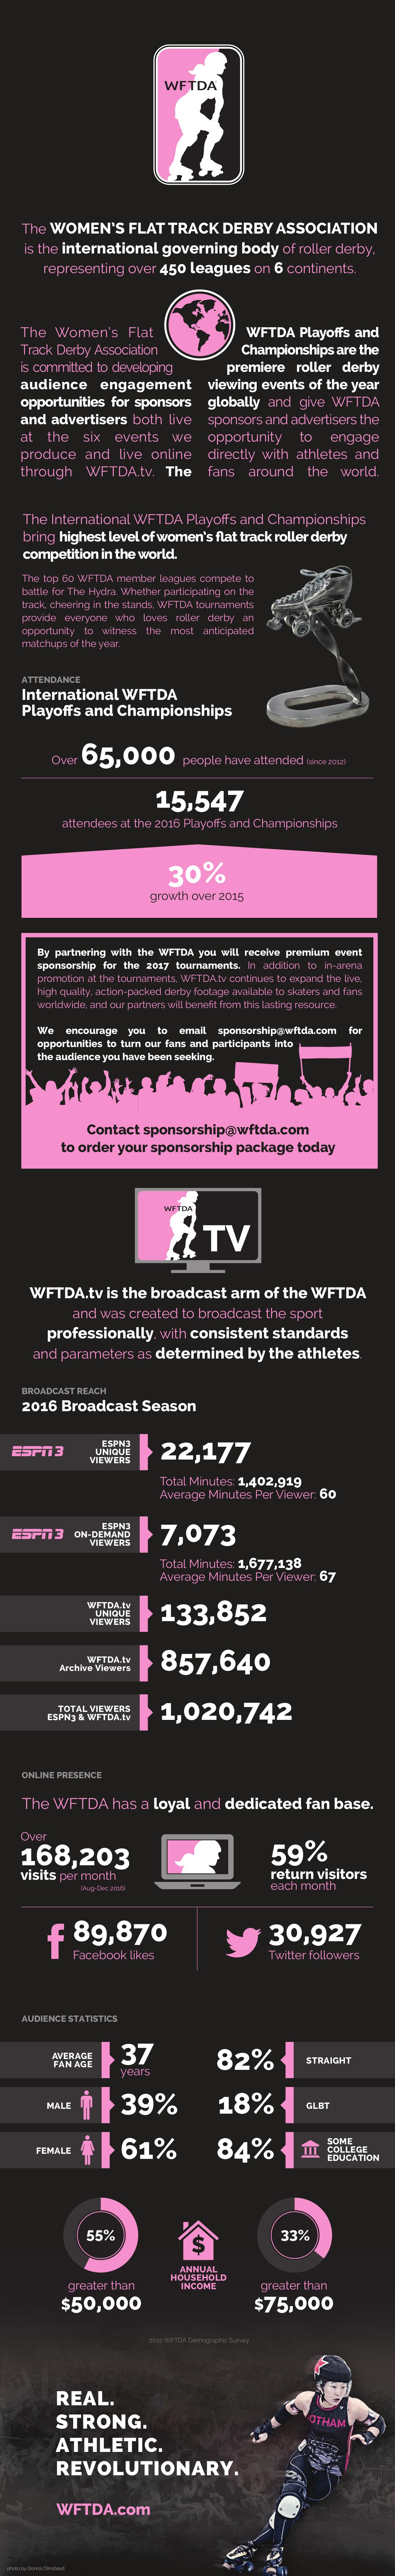 WFTDA Sponsorship Infographic